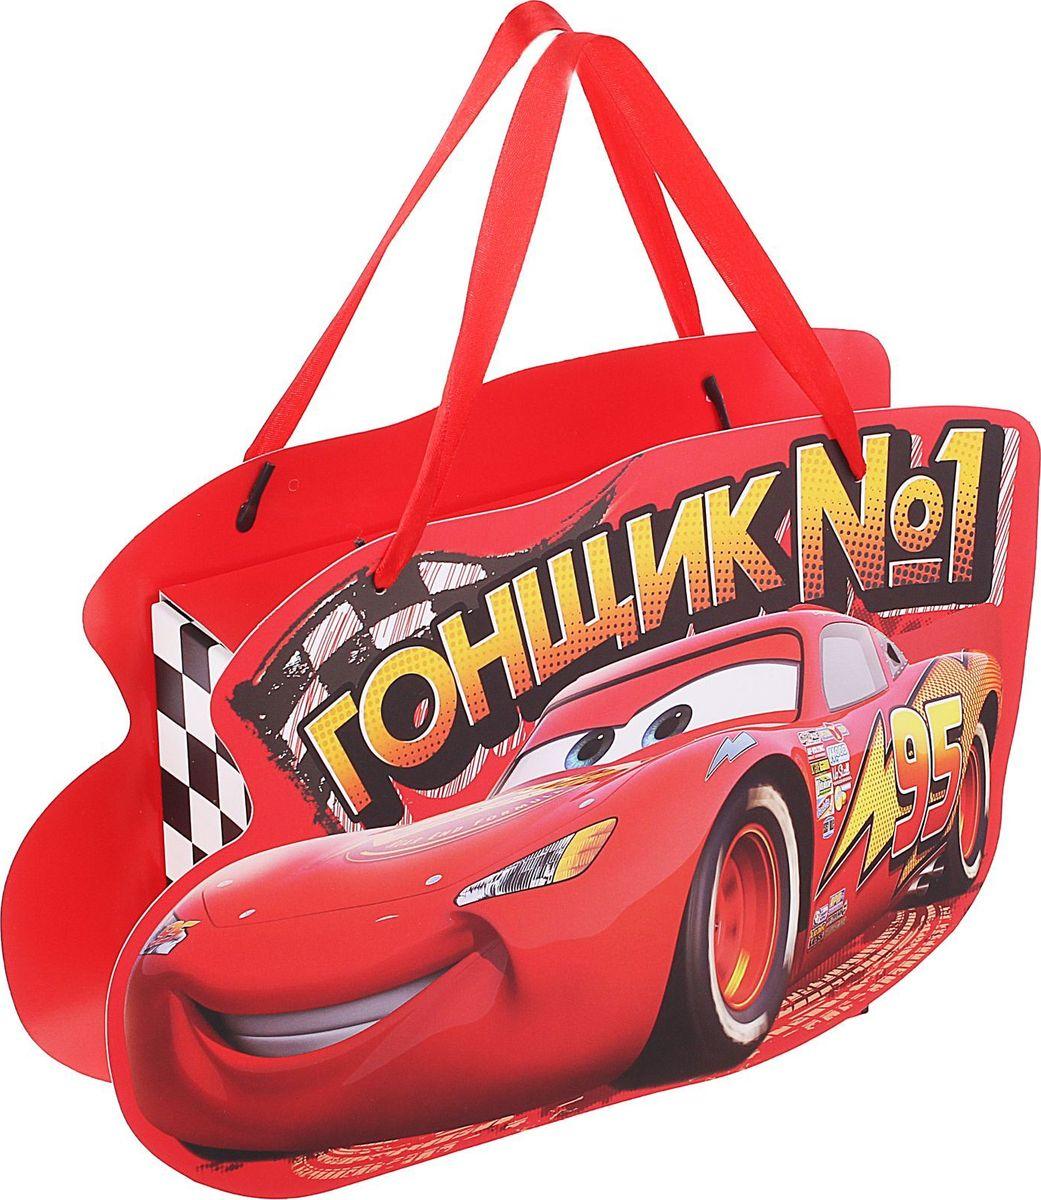 Disney Коробка подарочная Гонщик Тачки 20 х 7 х 15,5 см -  Подарочная упаковка